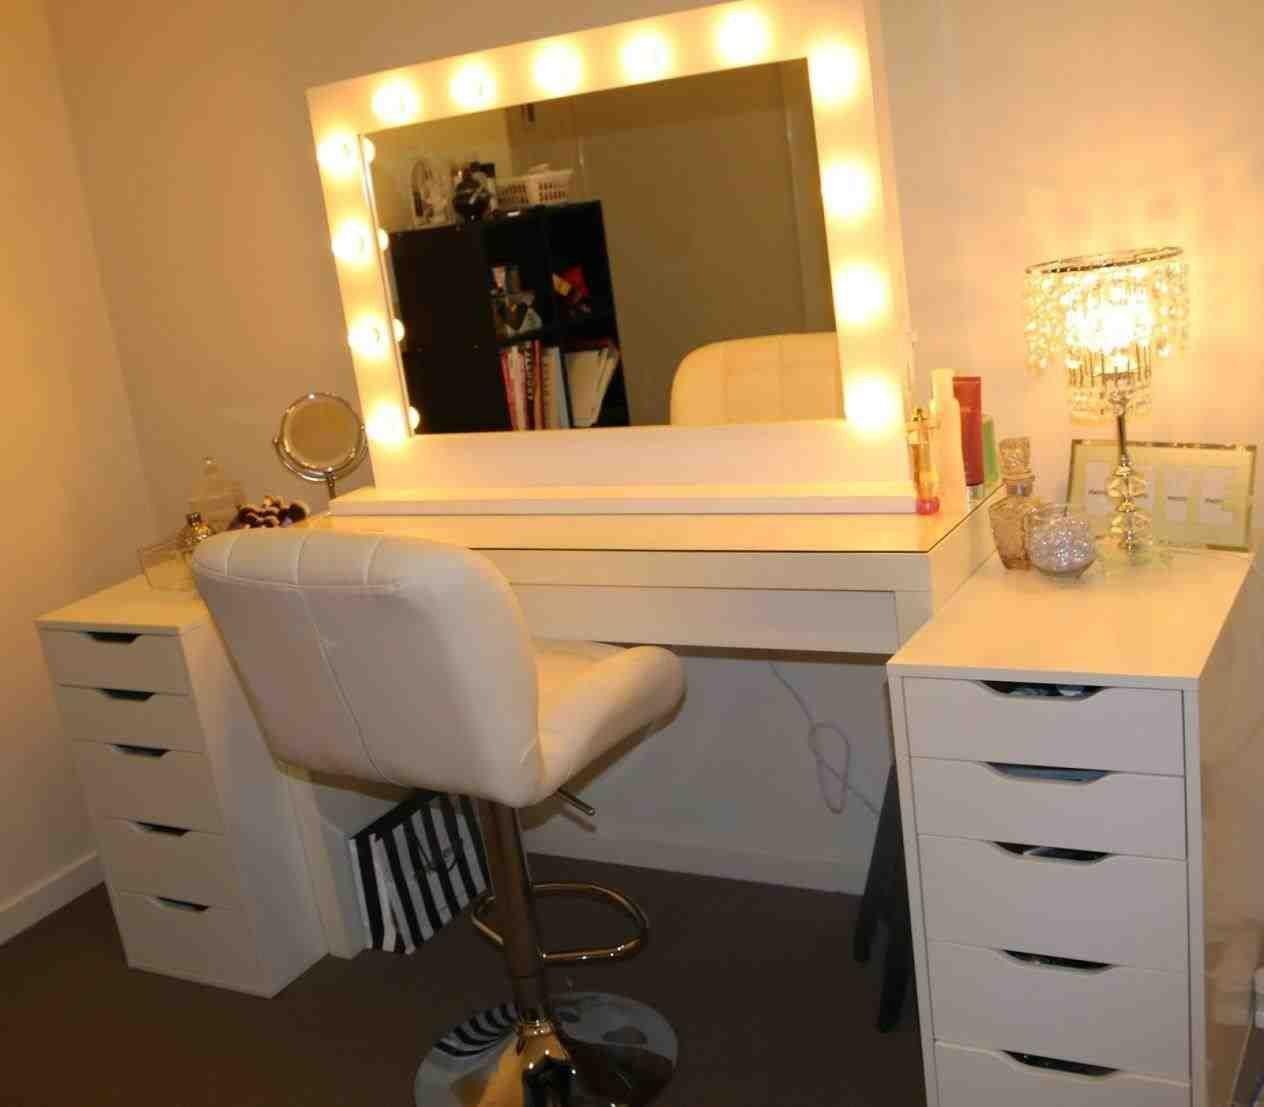 Bedroom Vanity with Light Beautiful ριитєяєѕт Bellakerz ♚